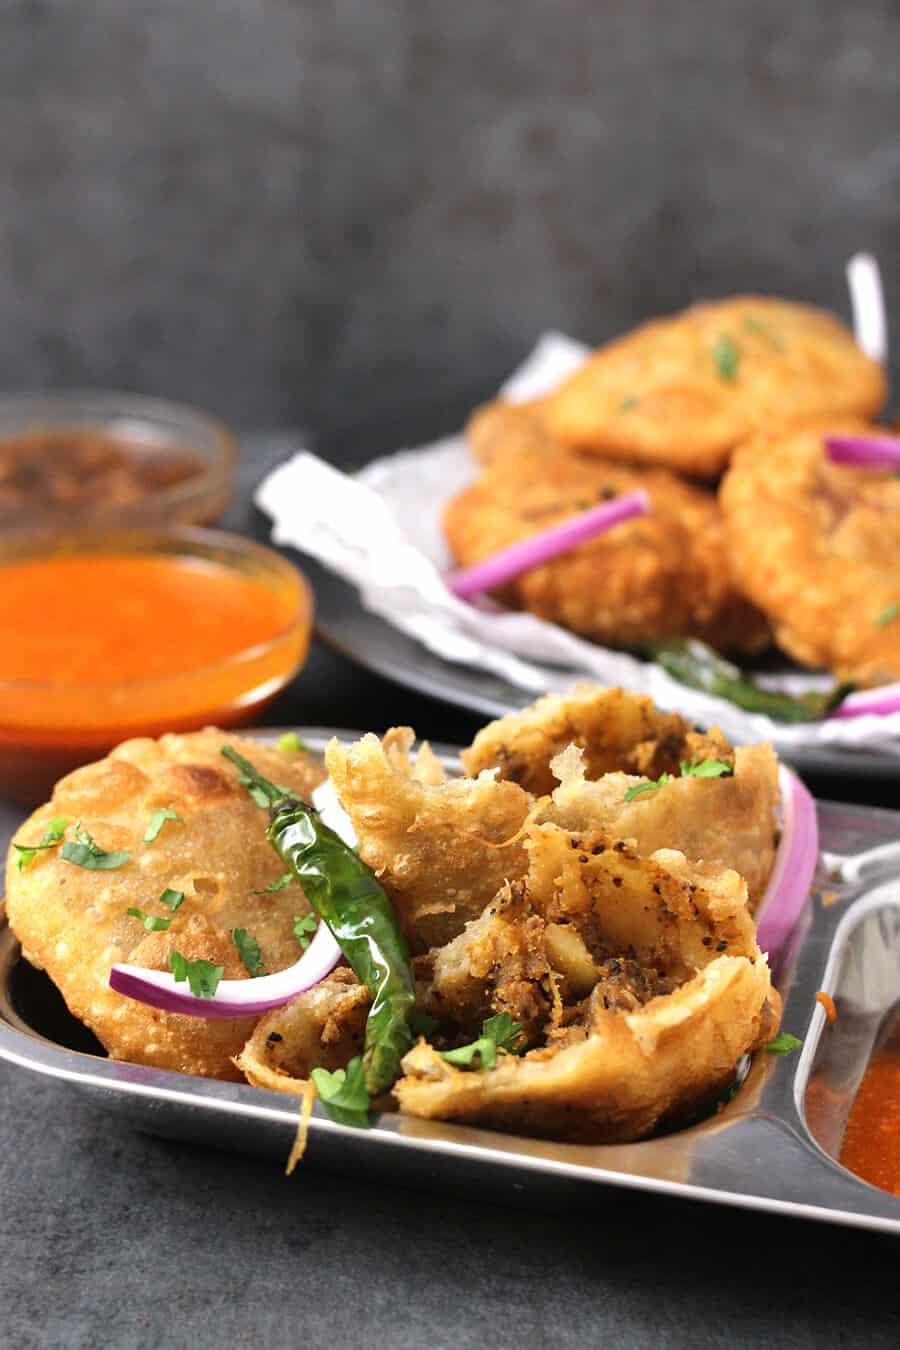 khasta kachori, raj kachori, moong dal kachori, aloo pyaz  kachori, indian street food, chats, chaat, evening snacks, diwali snacks recipes